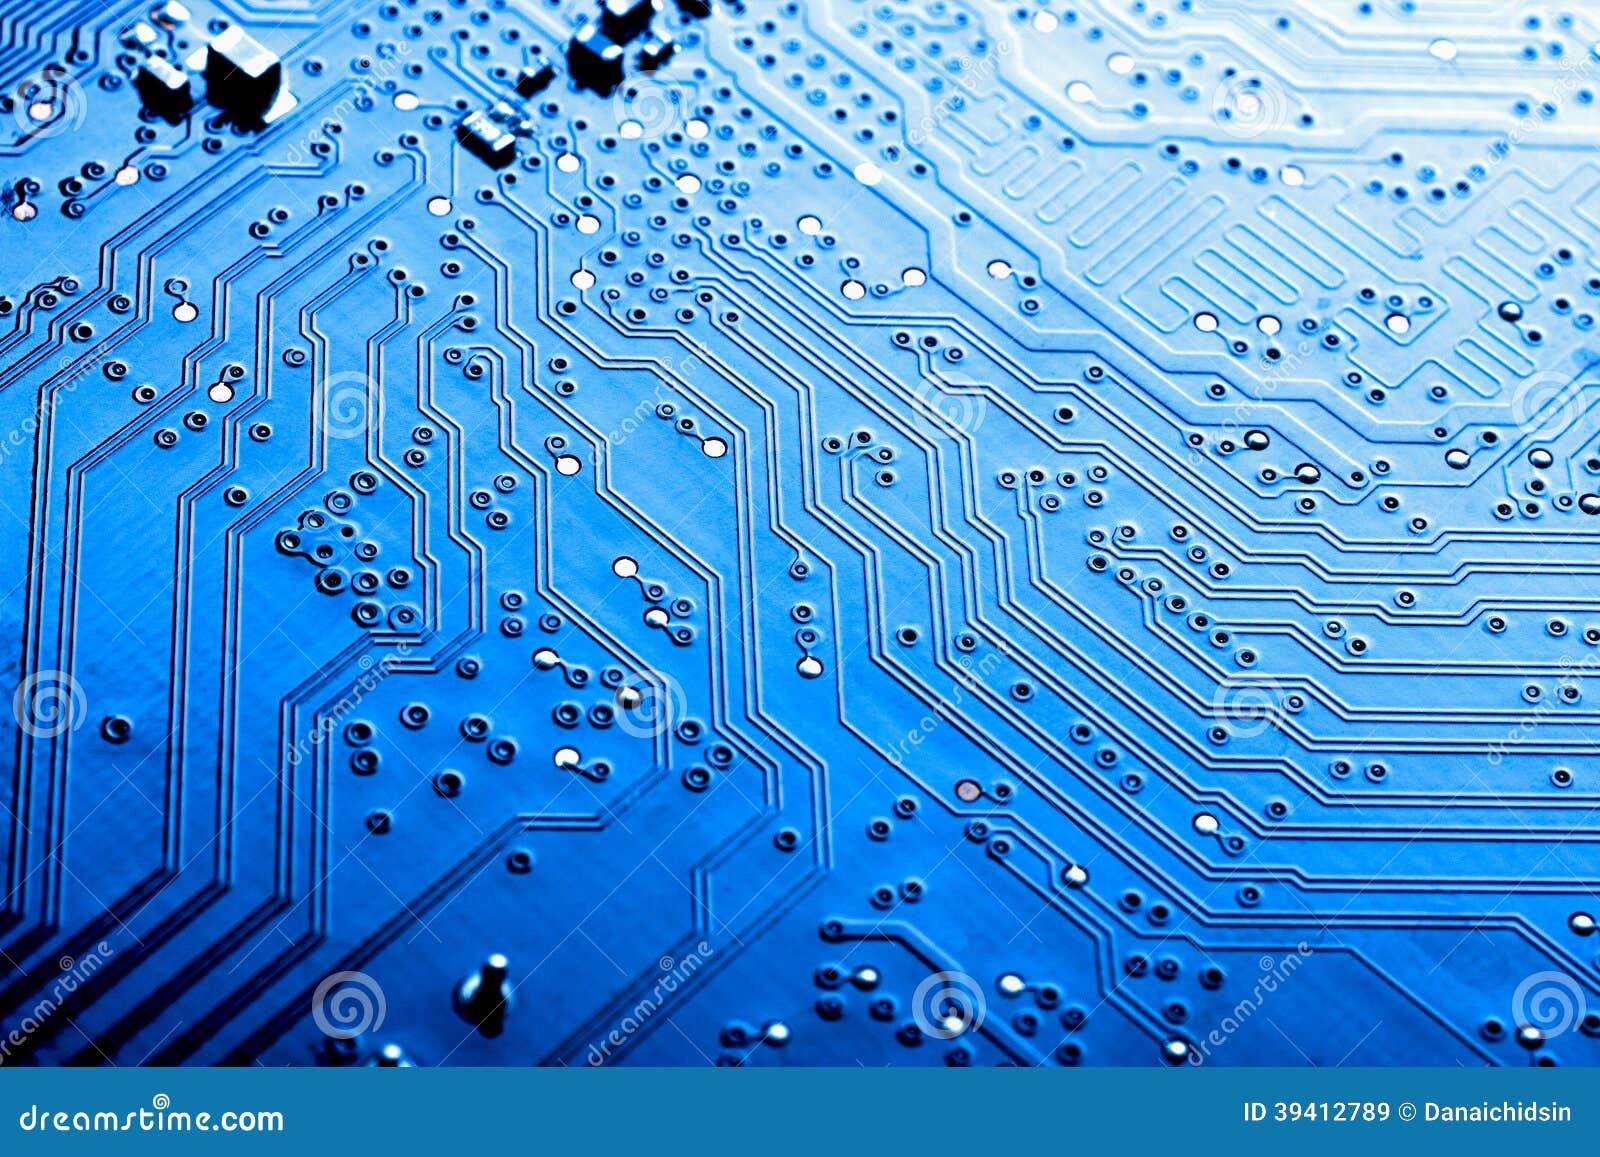 electrical circuit background - Gidiye.redformapolitica.co